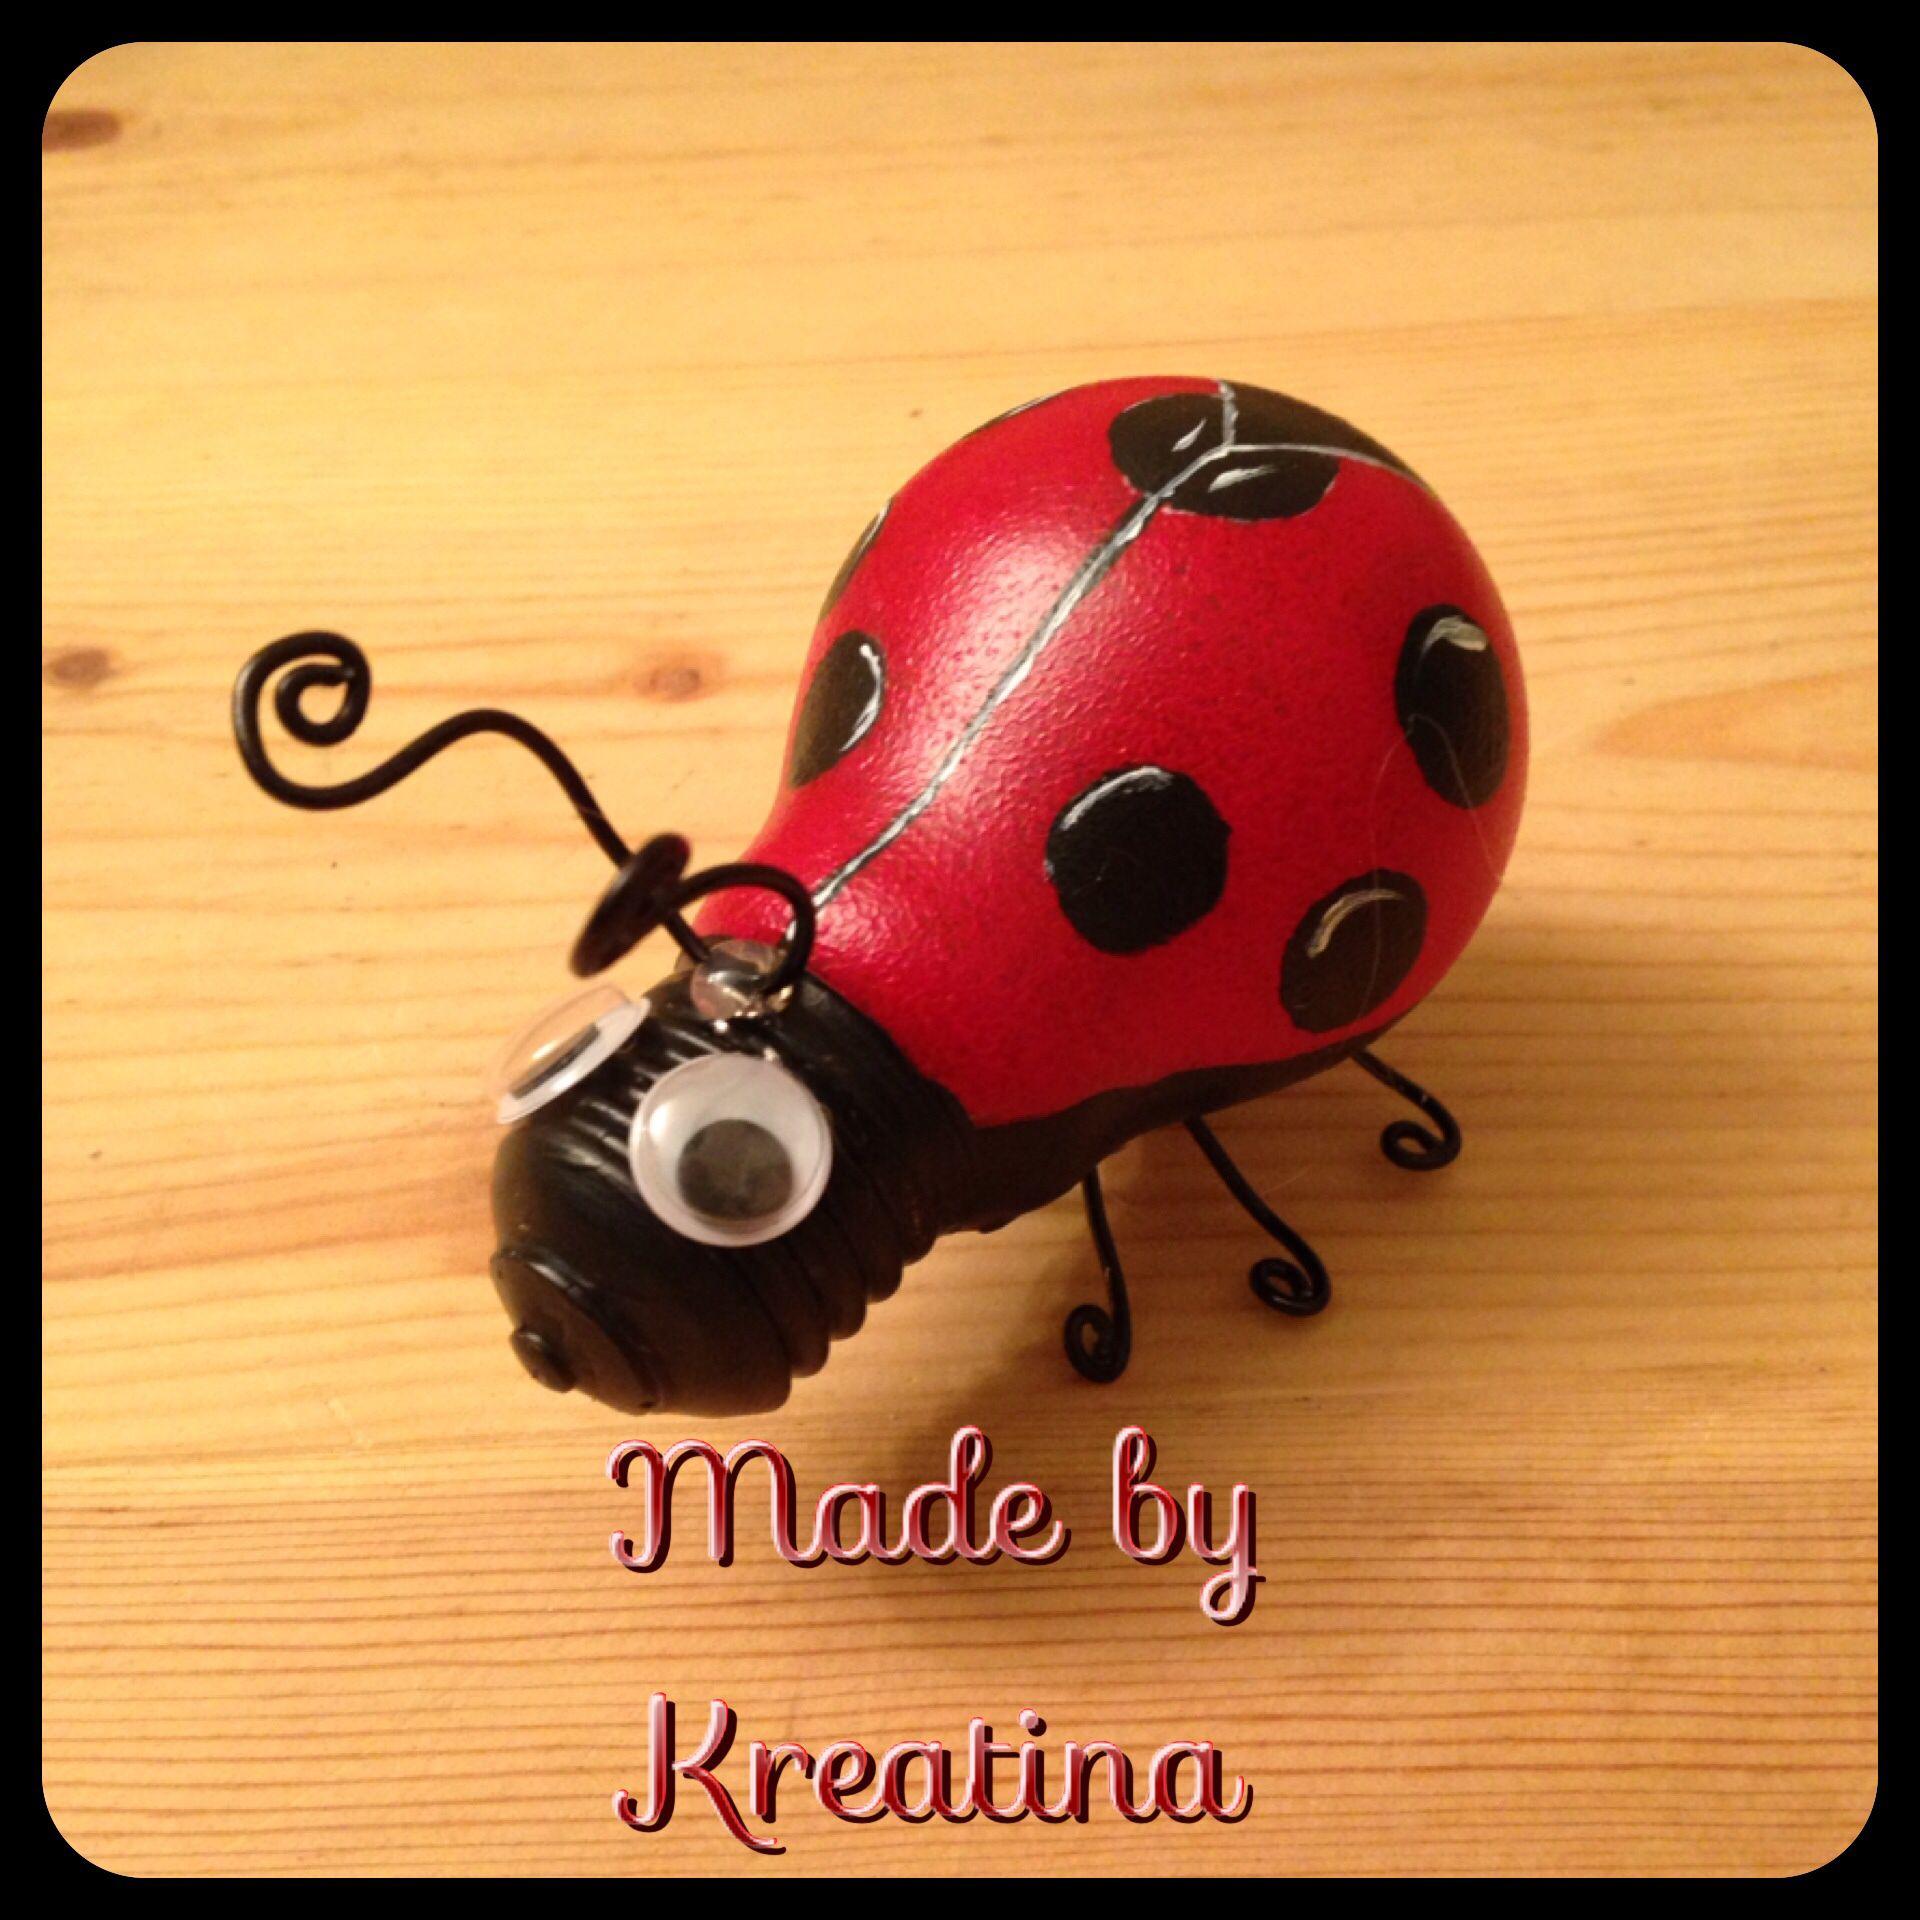 Ladybug - Mariehøne | Light...bulb...ideas | Pinterest | Light ... for Painted Light Bulb Art  584dqh